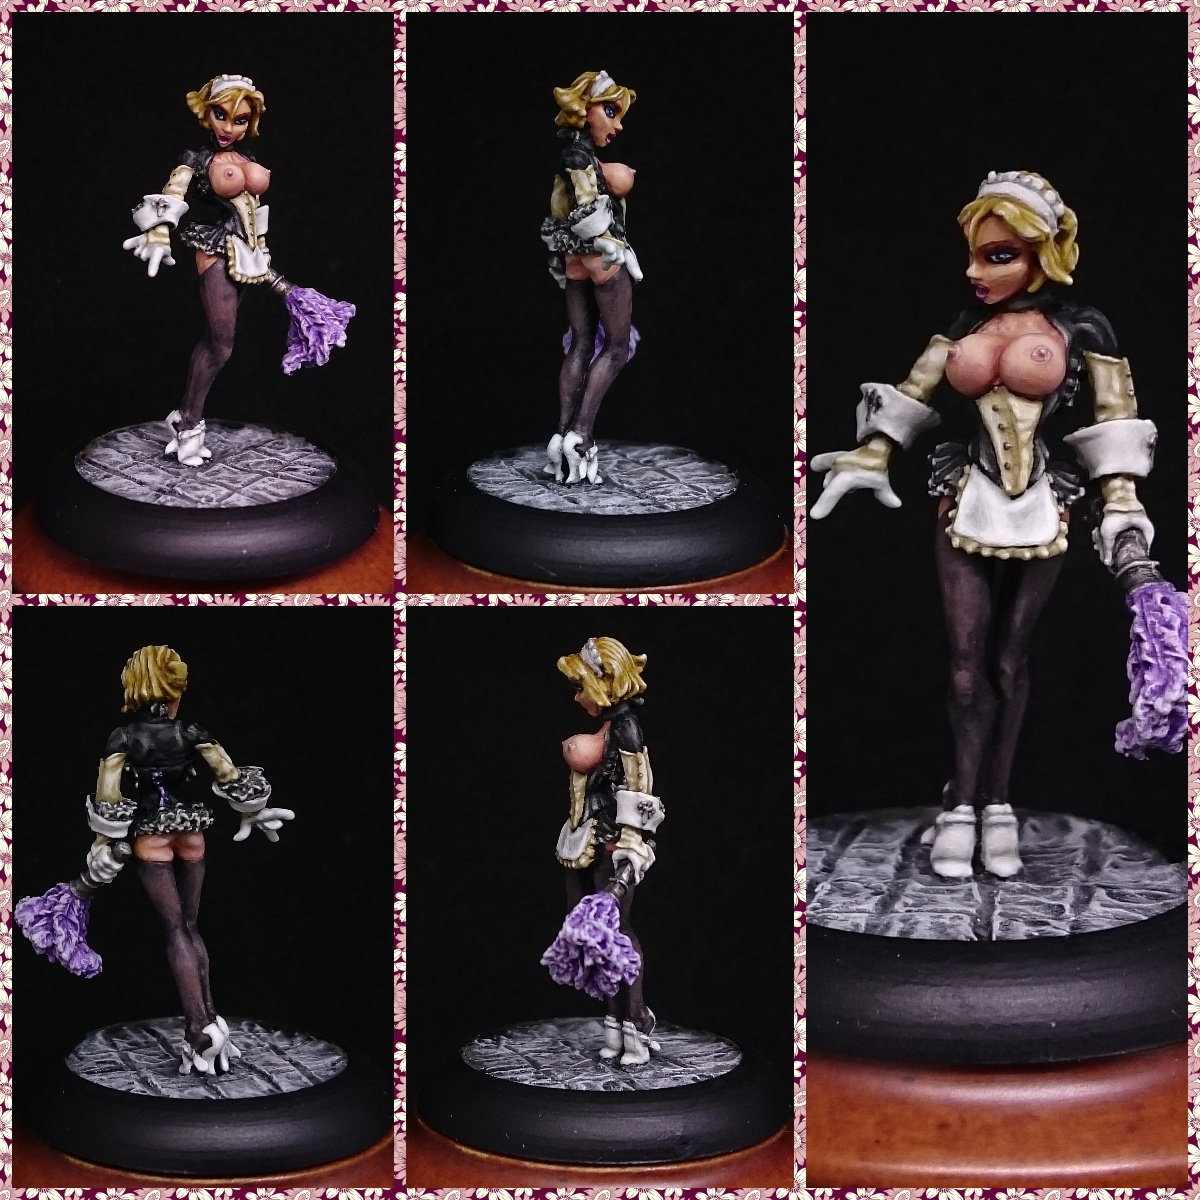 Brigitte, the French Maid